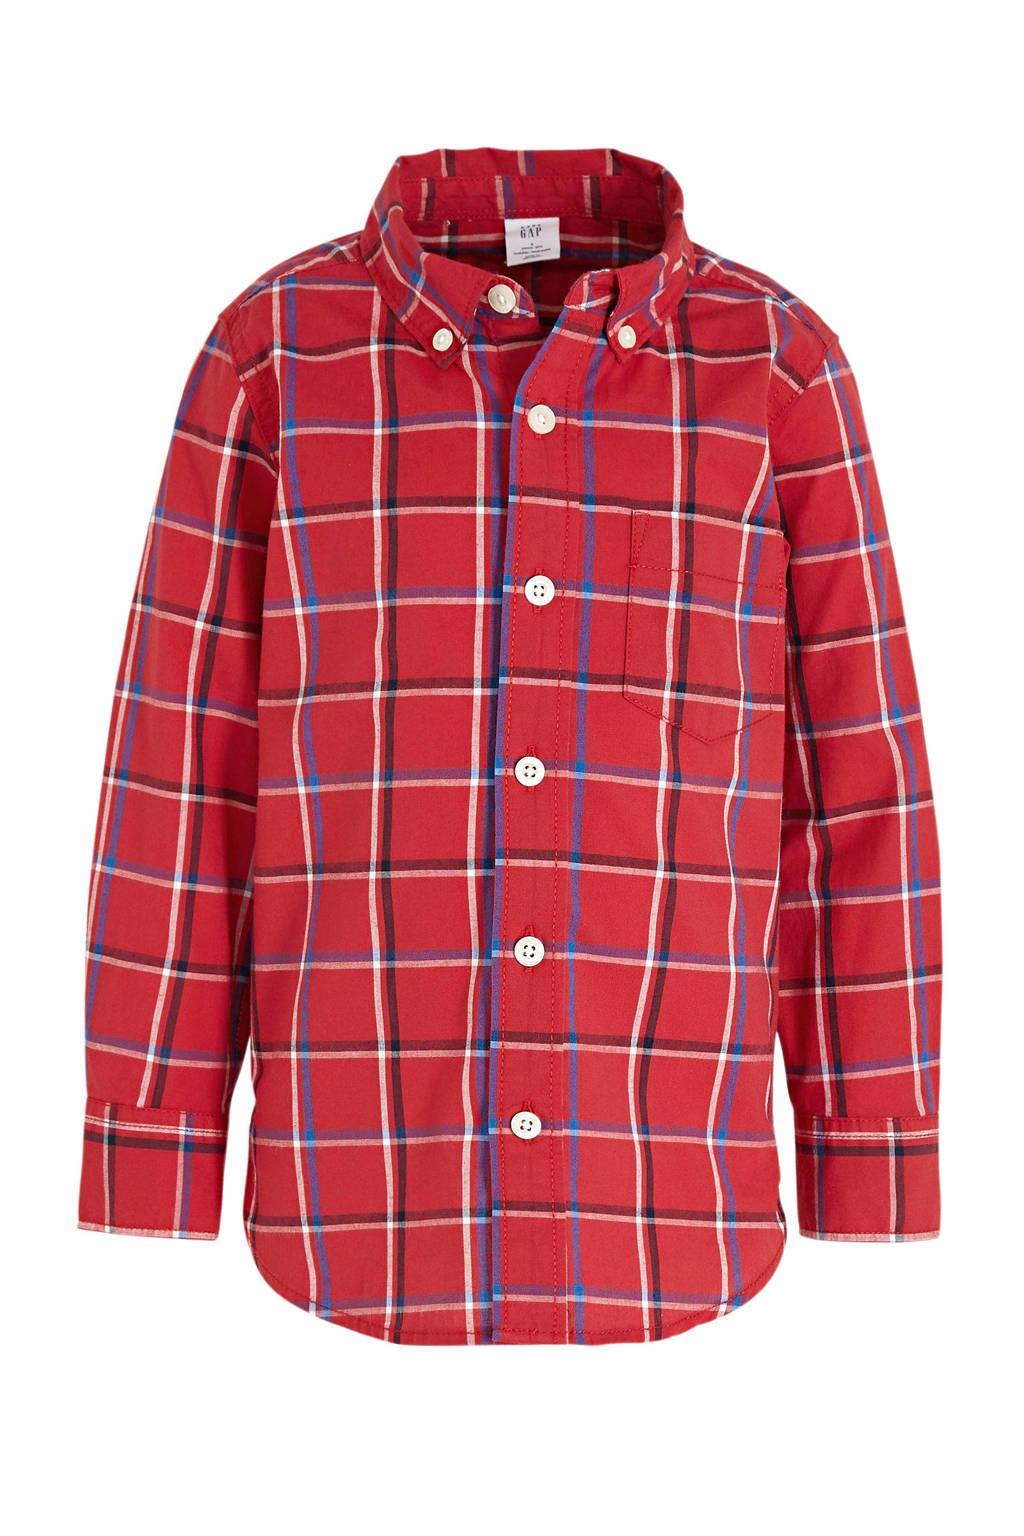 GAP geruit overhemd Poplin rood, Rood